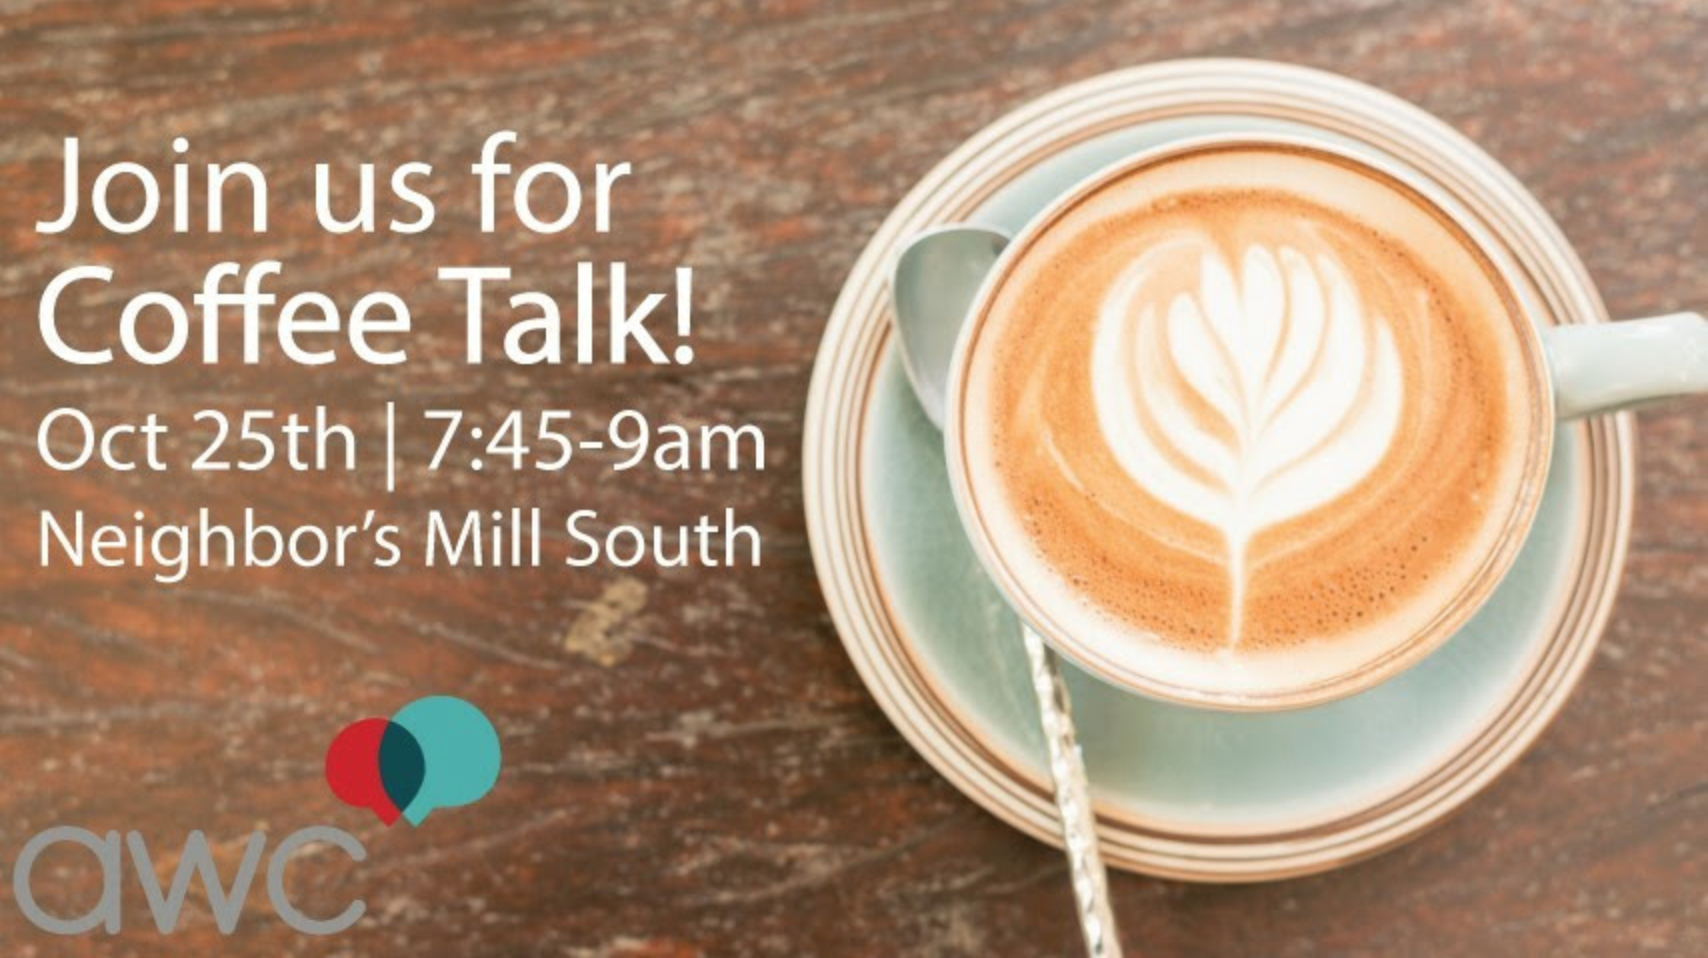 October Coffee Talk in Springfield, MO